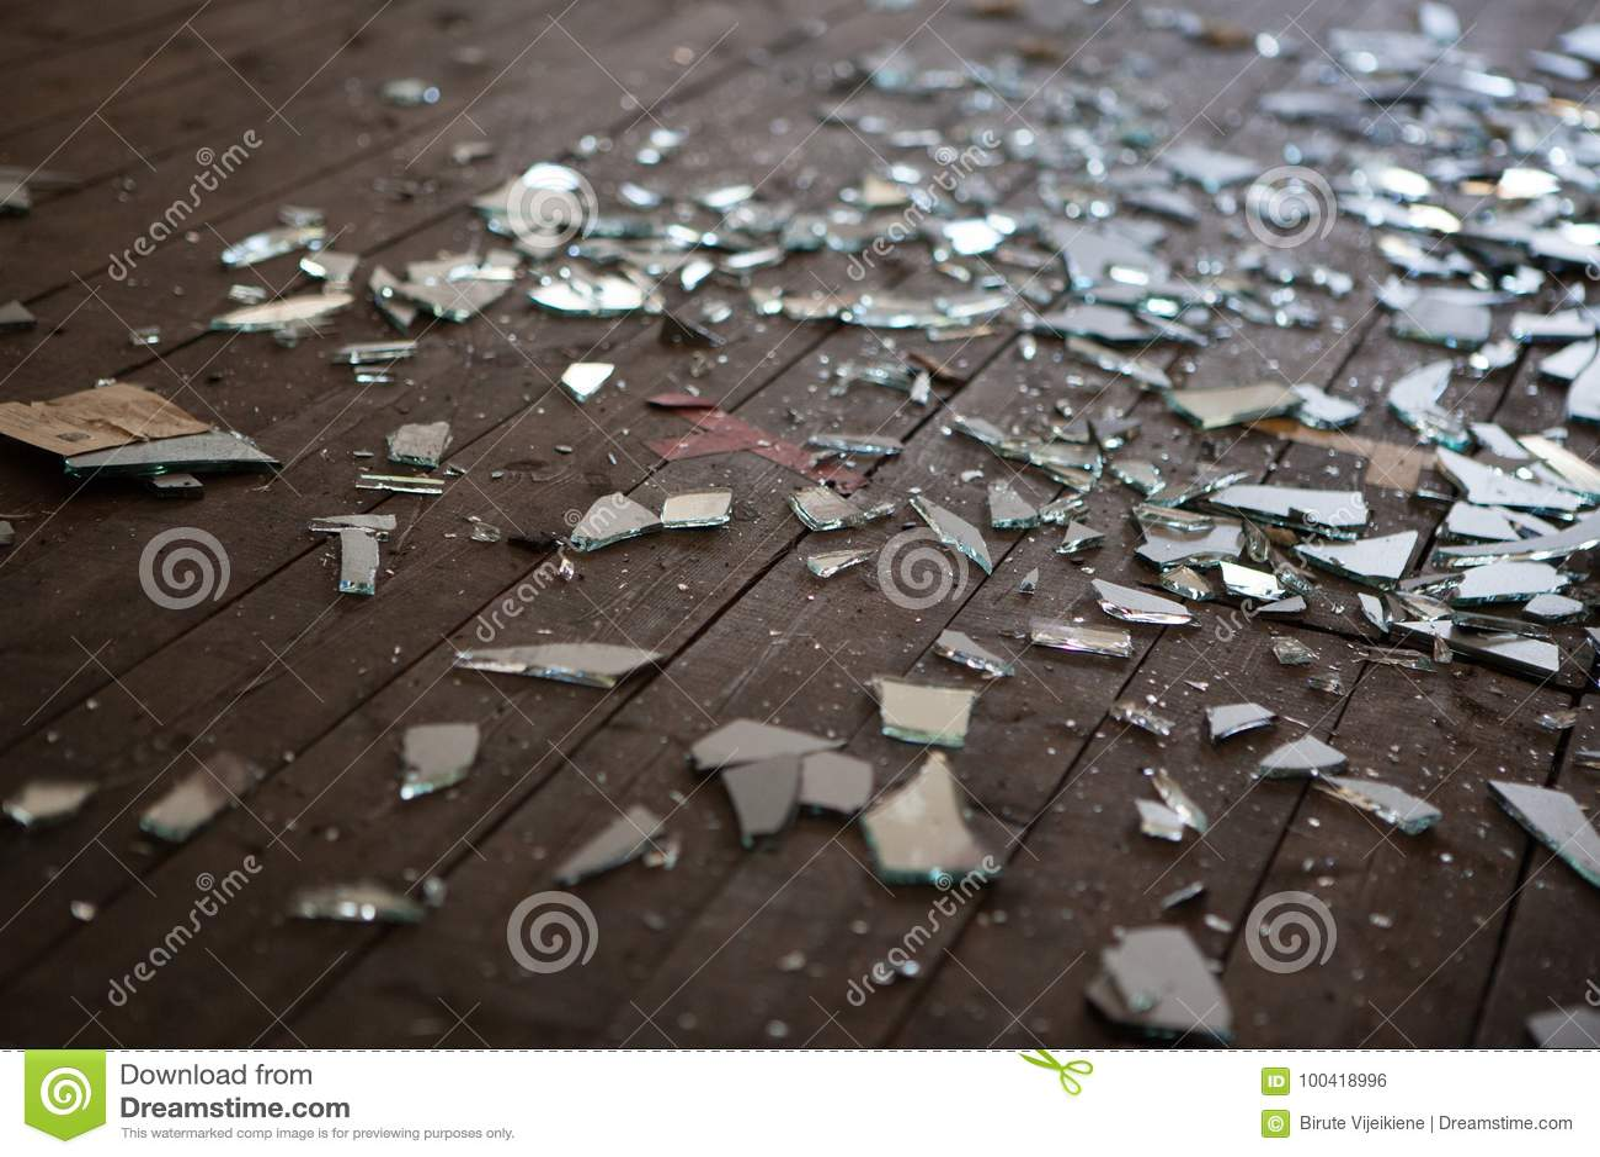 Pedazos de vidrio o de espejo roto